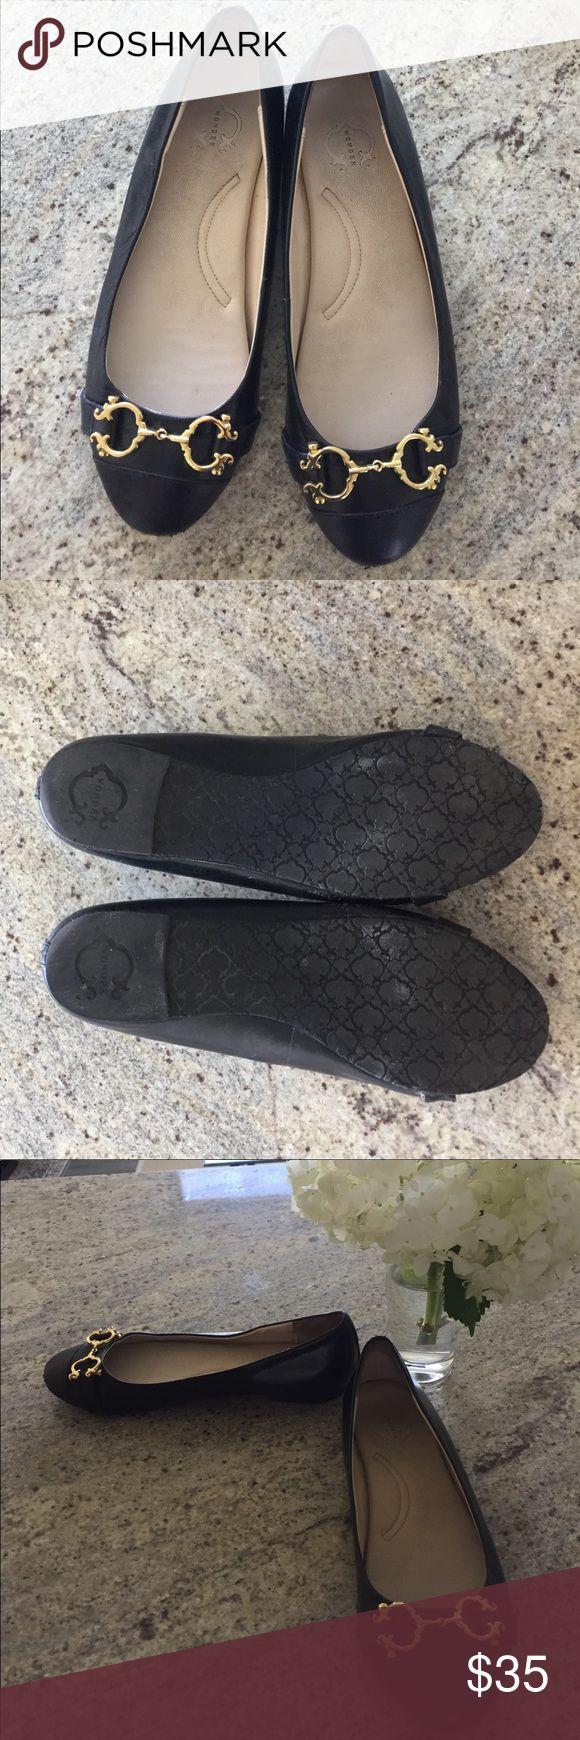 C Wonder Black Flats Black flats by C Wonder- size 8. Perfect for work! C Wonder Shoes Flats & Loafers